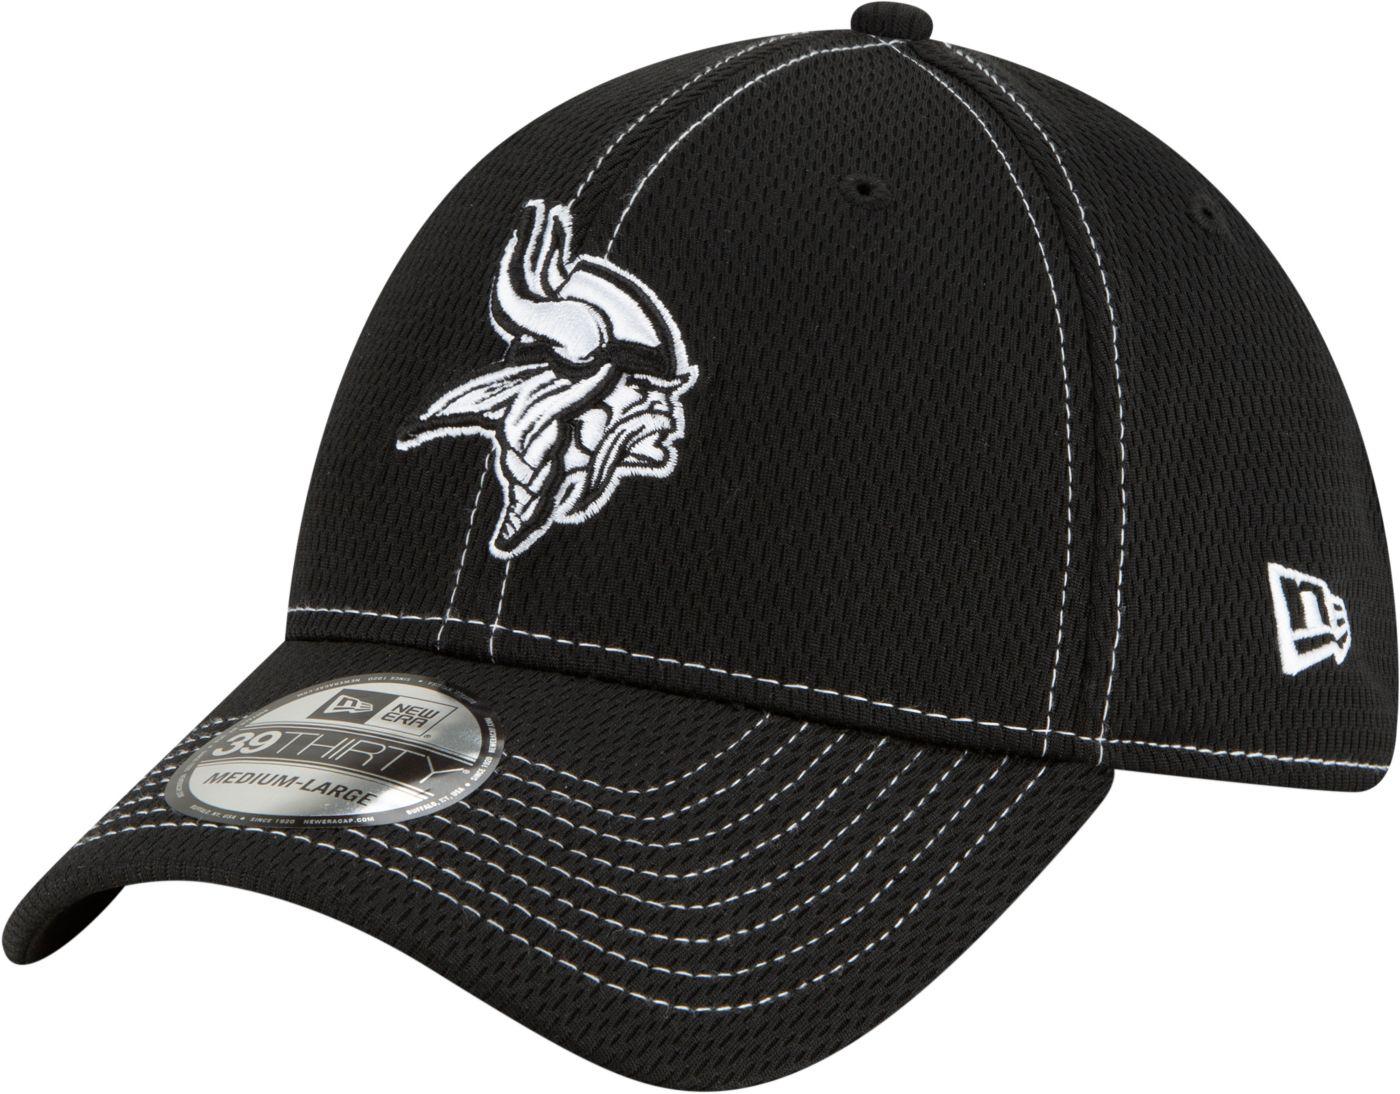 New Era Men's Minnesota Vikings Sideline Road 39Thirty Stretch Fit Black Hat